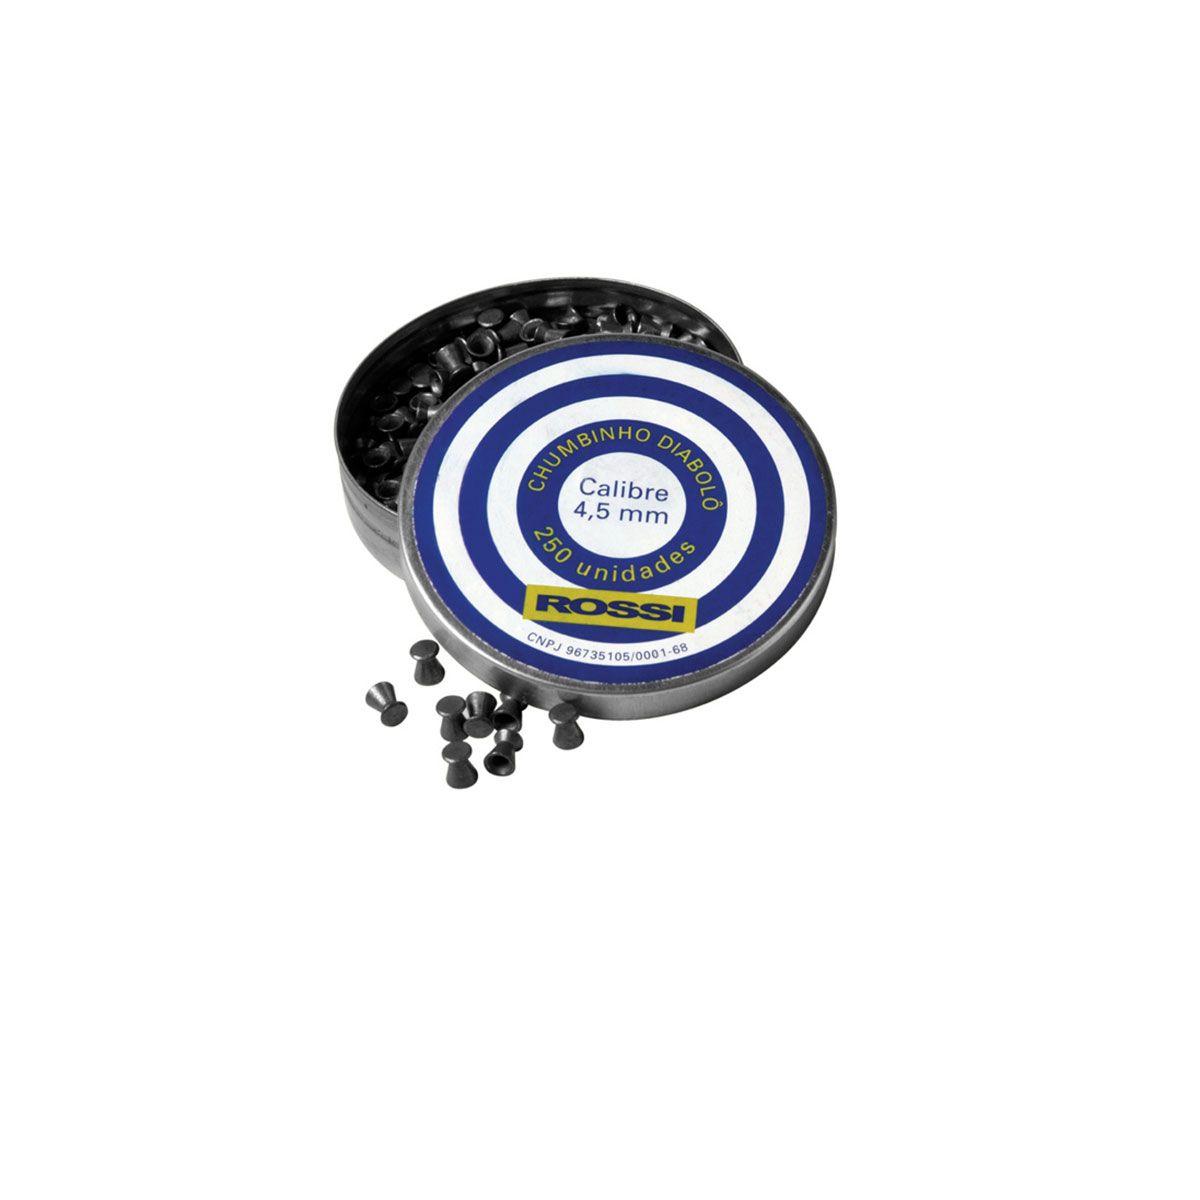 Chumbinho Rossi Diabolo 4,5mm (250 UM)